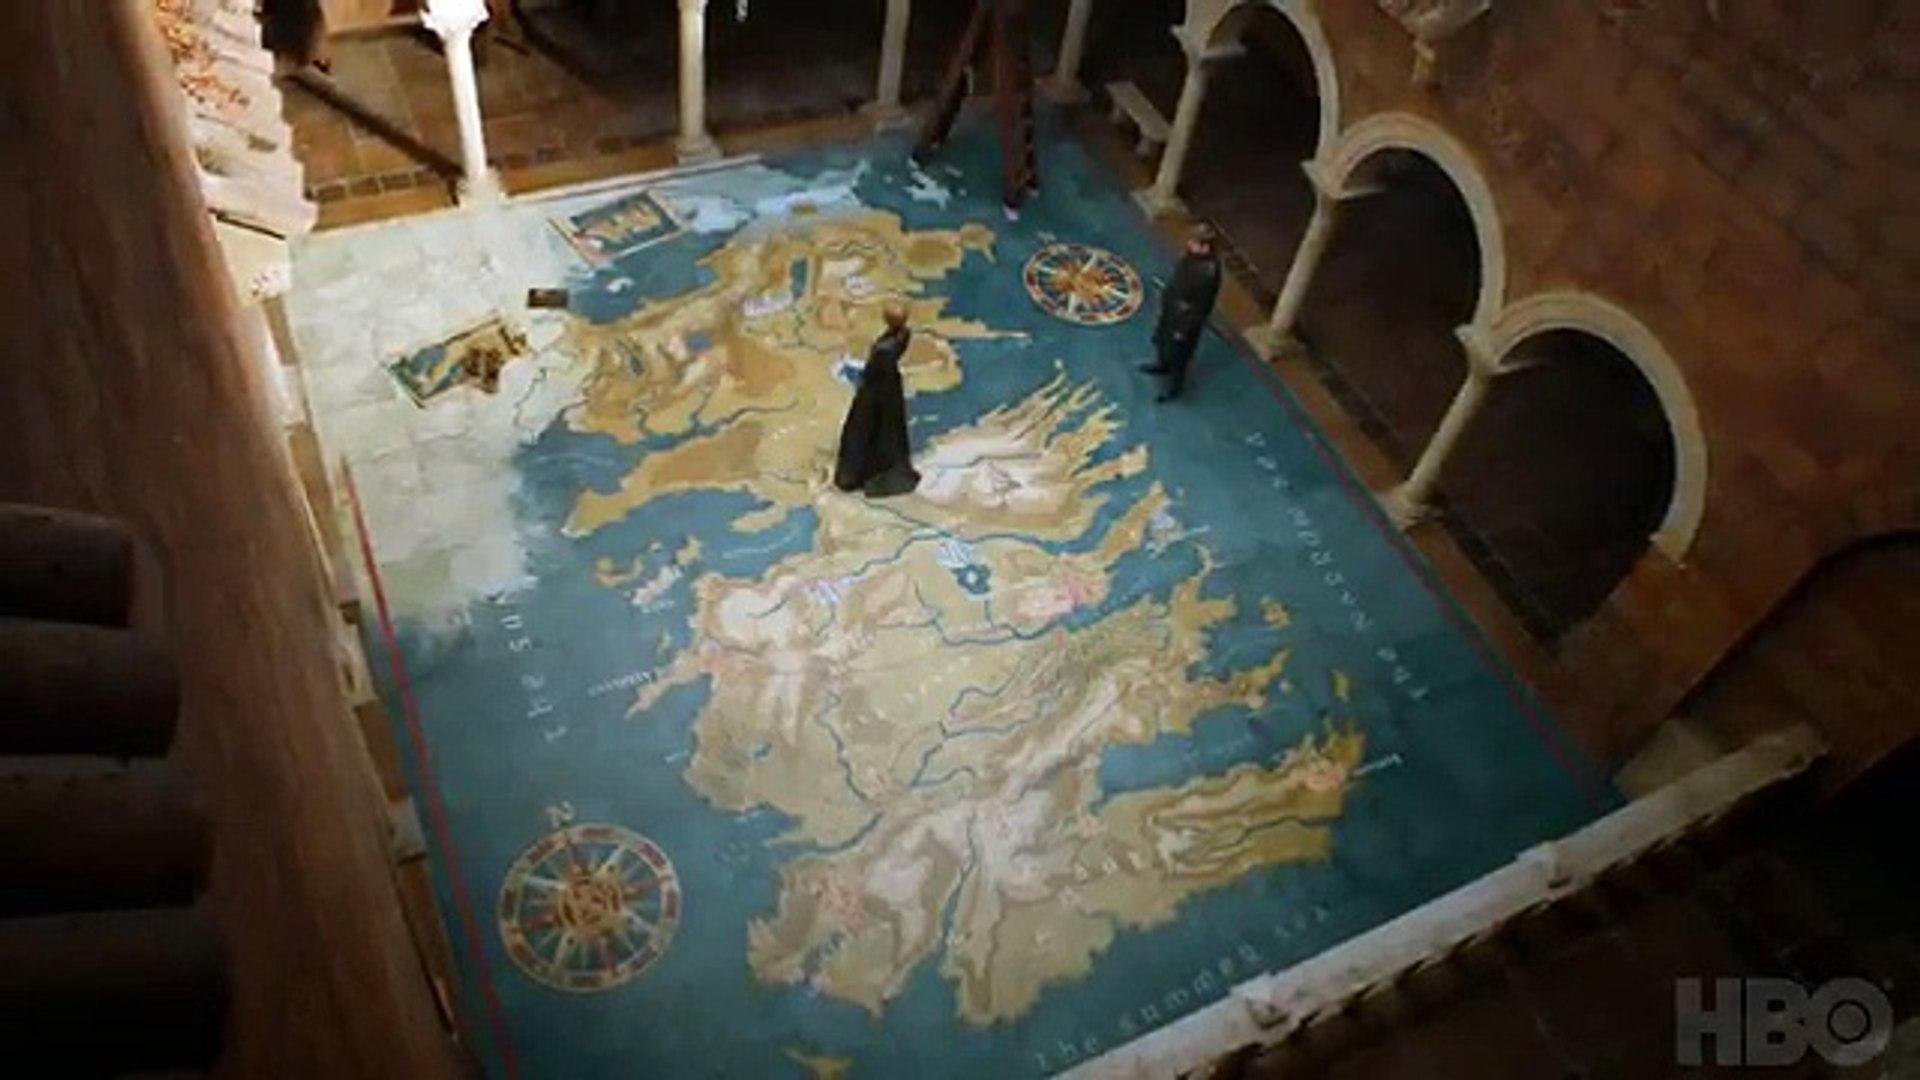 Game of Thrones Season 7 Trailer (2017) _ TV Trailer _ Movieclips Trailers - Full HD Movie Trailer